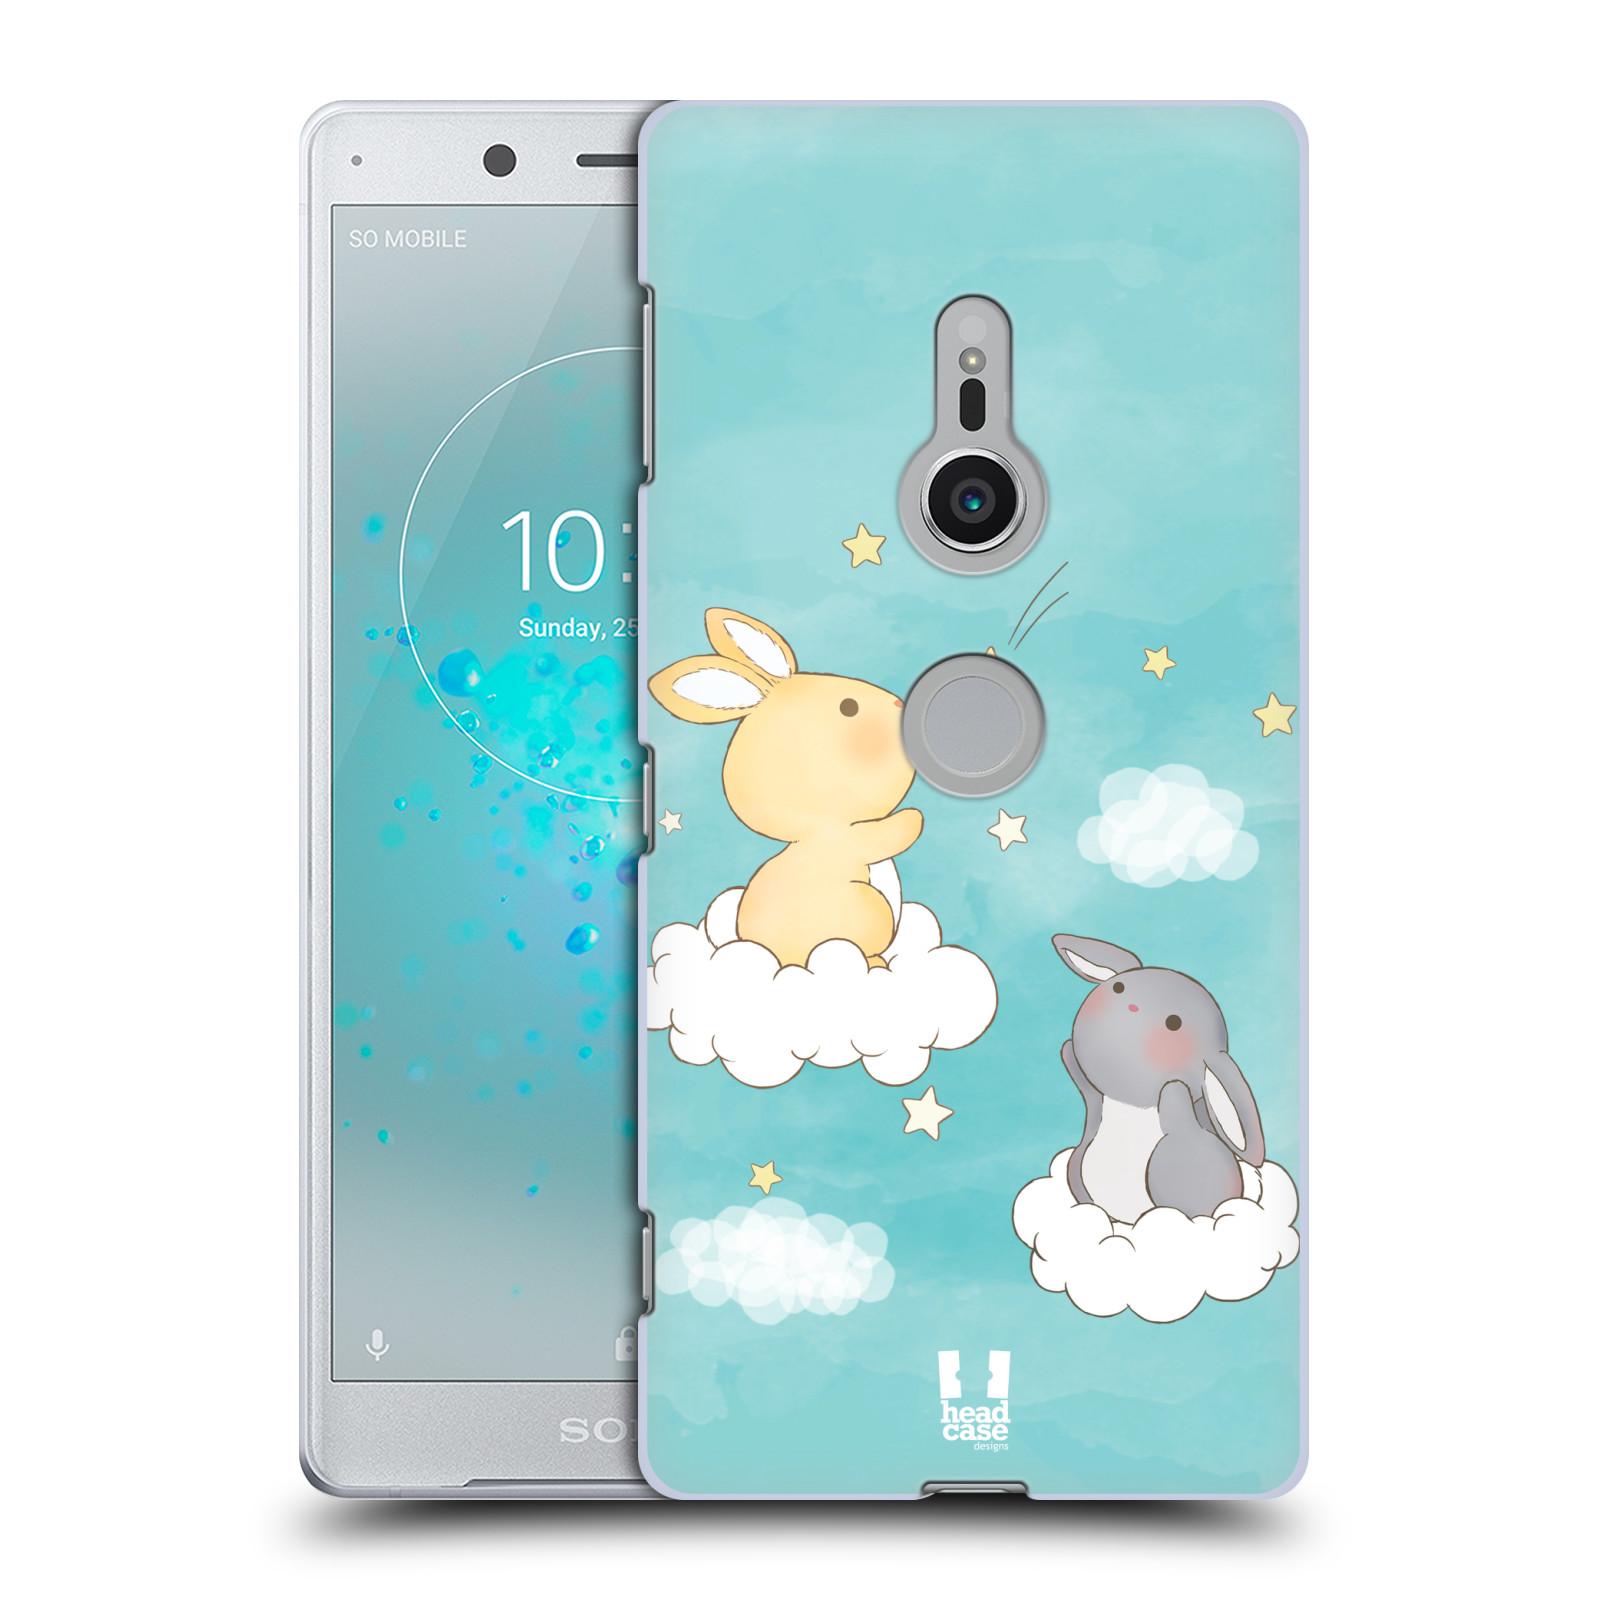 HEAD CASE plastový obal na mobil Sony Xperia XZ2 vzor králíček a hvězdy modrá